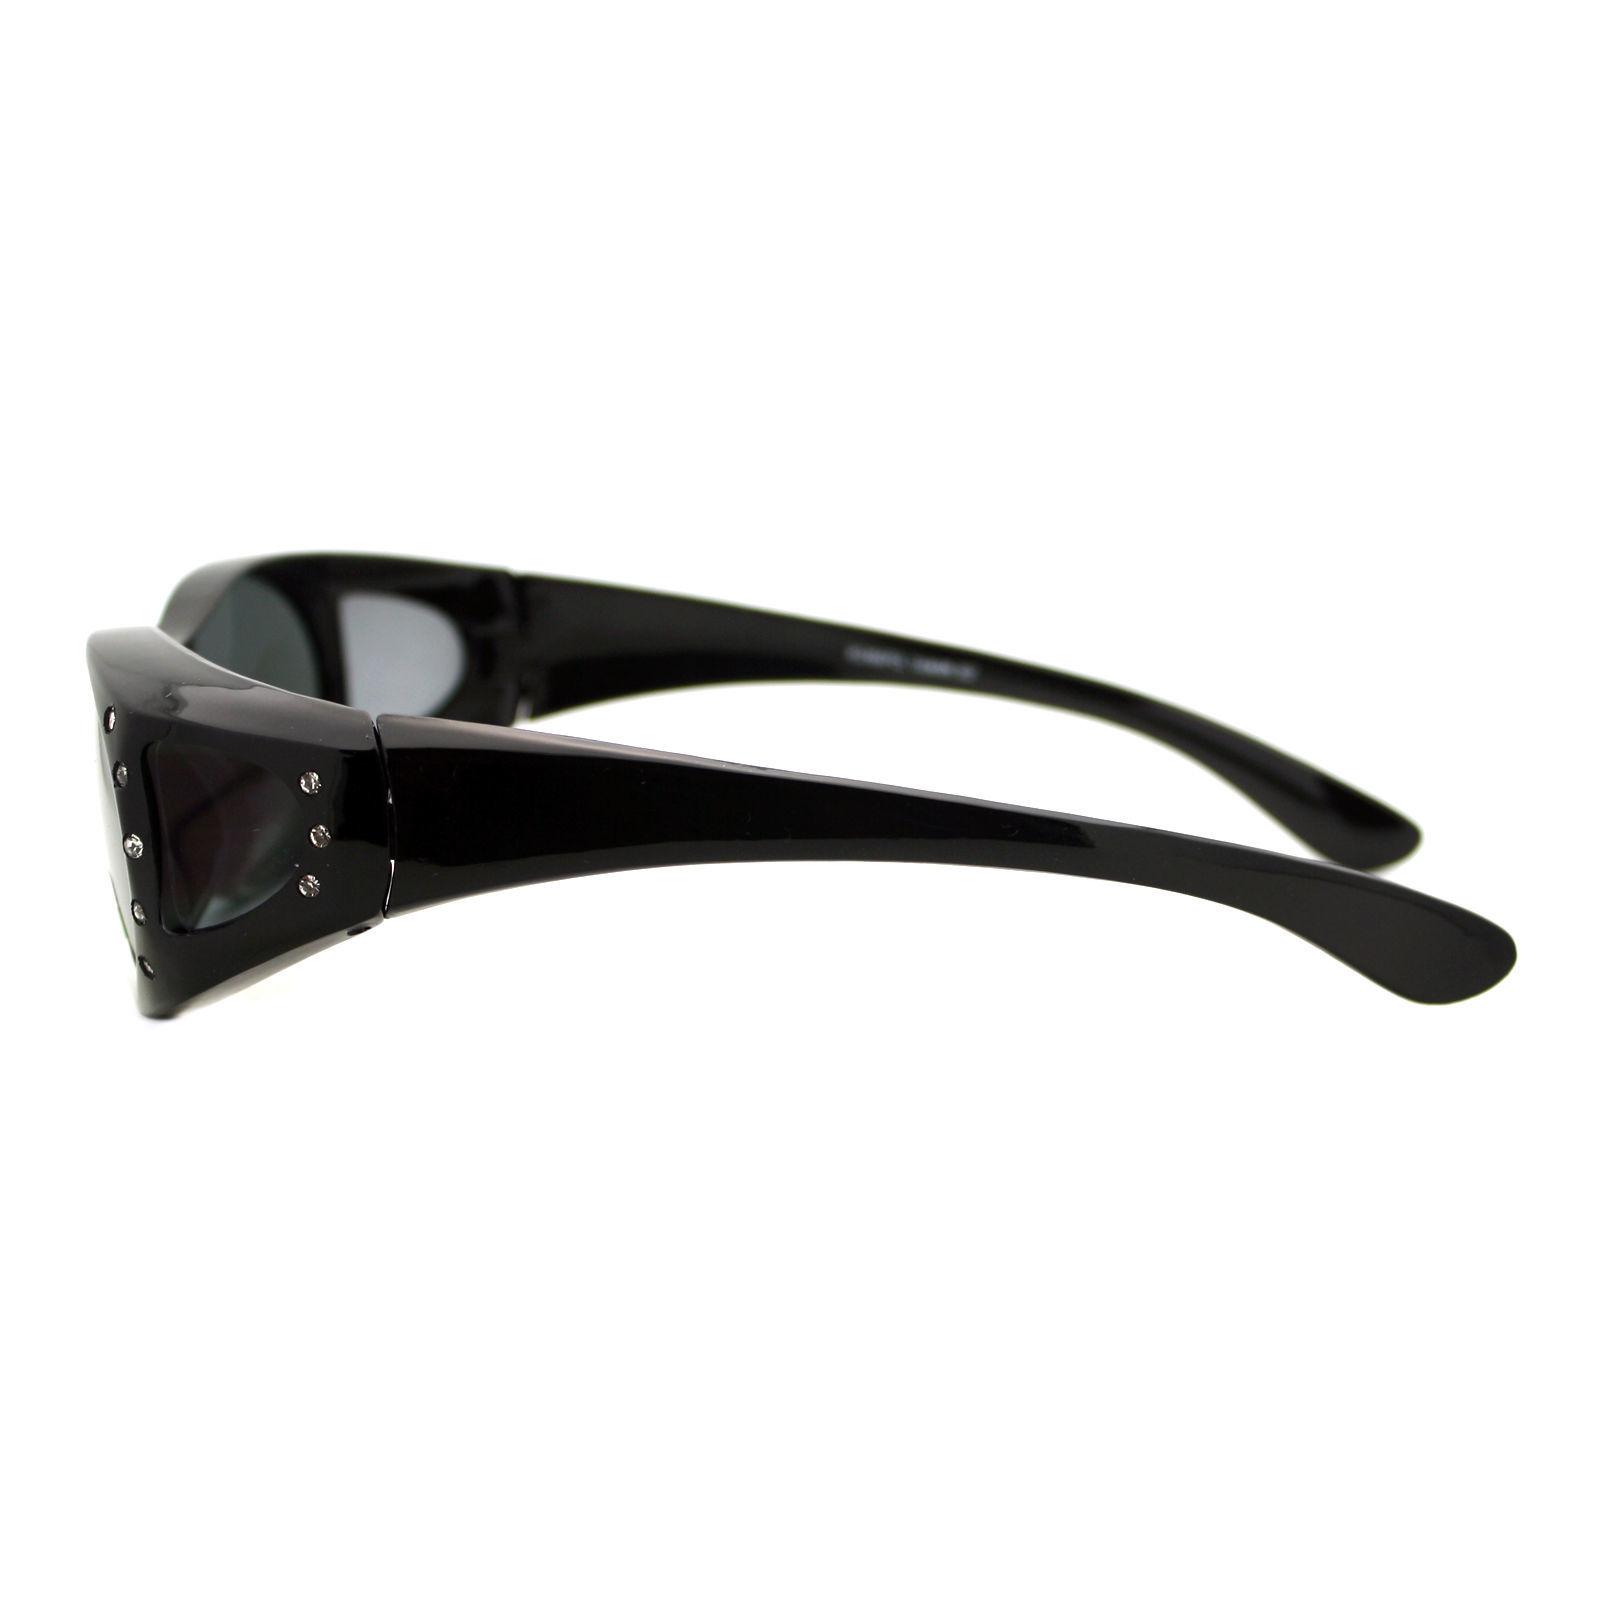 Womens Fit Over Glasses Polarized Sunglasses Oval Rhinestone Frame